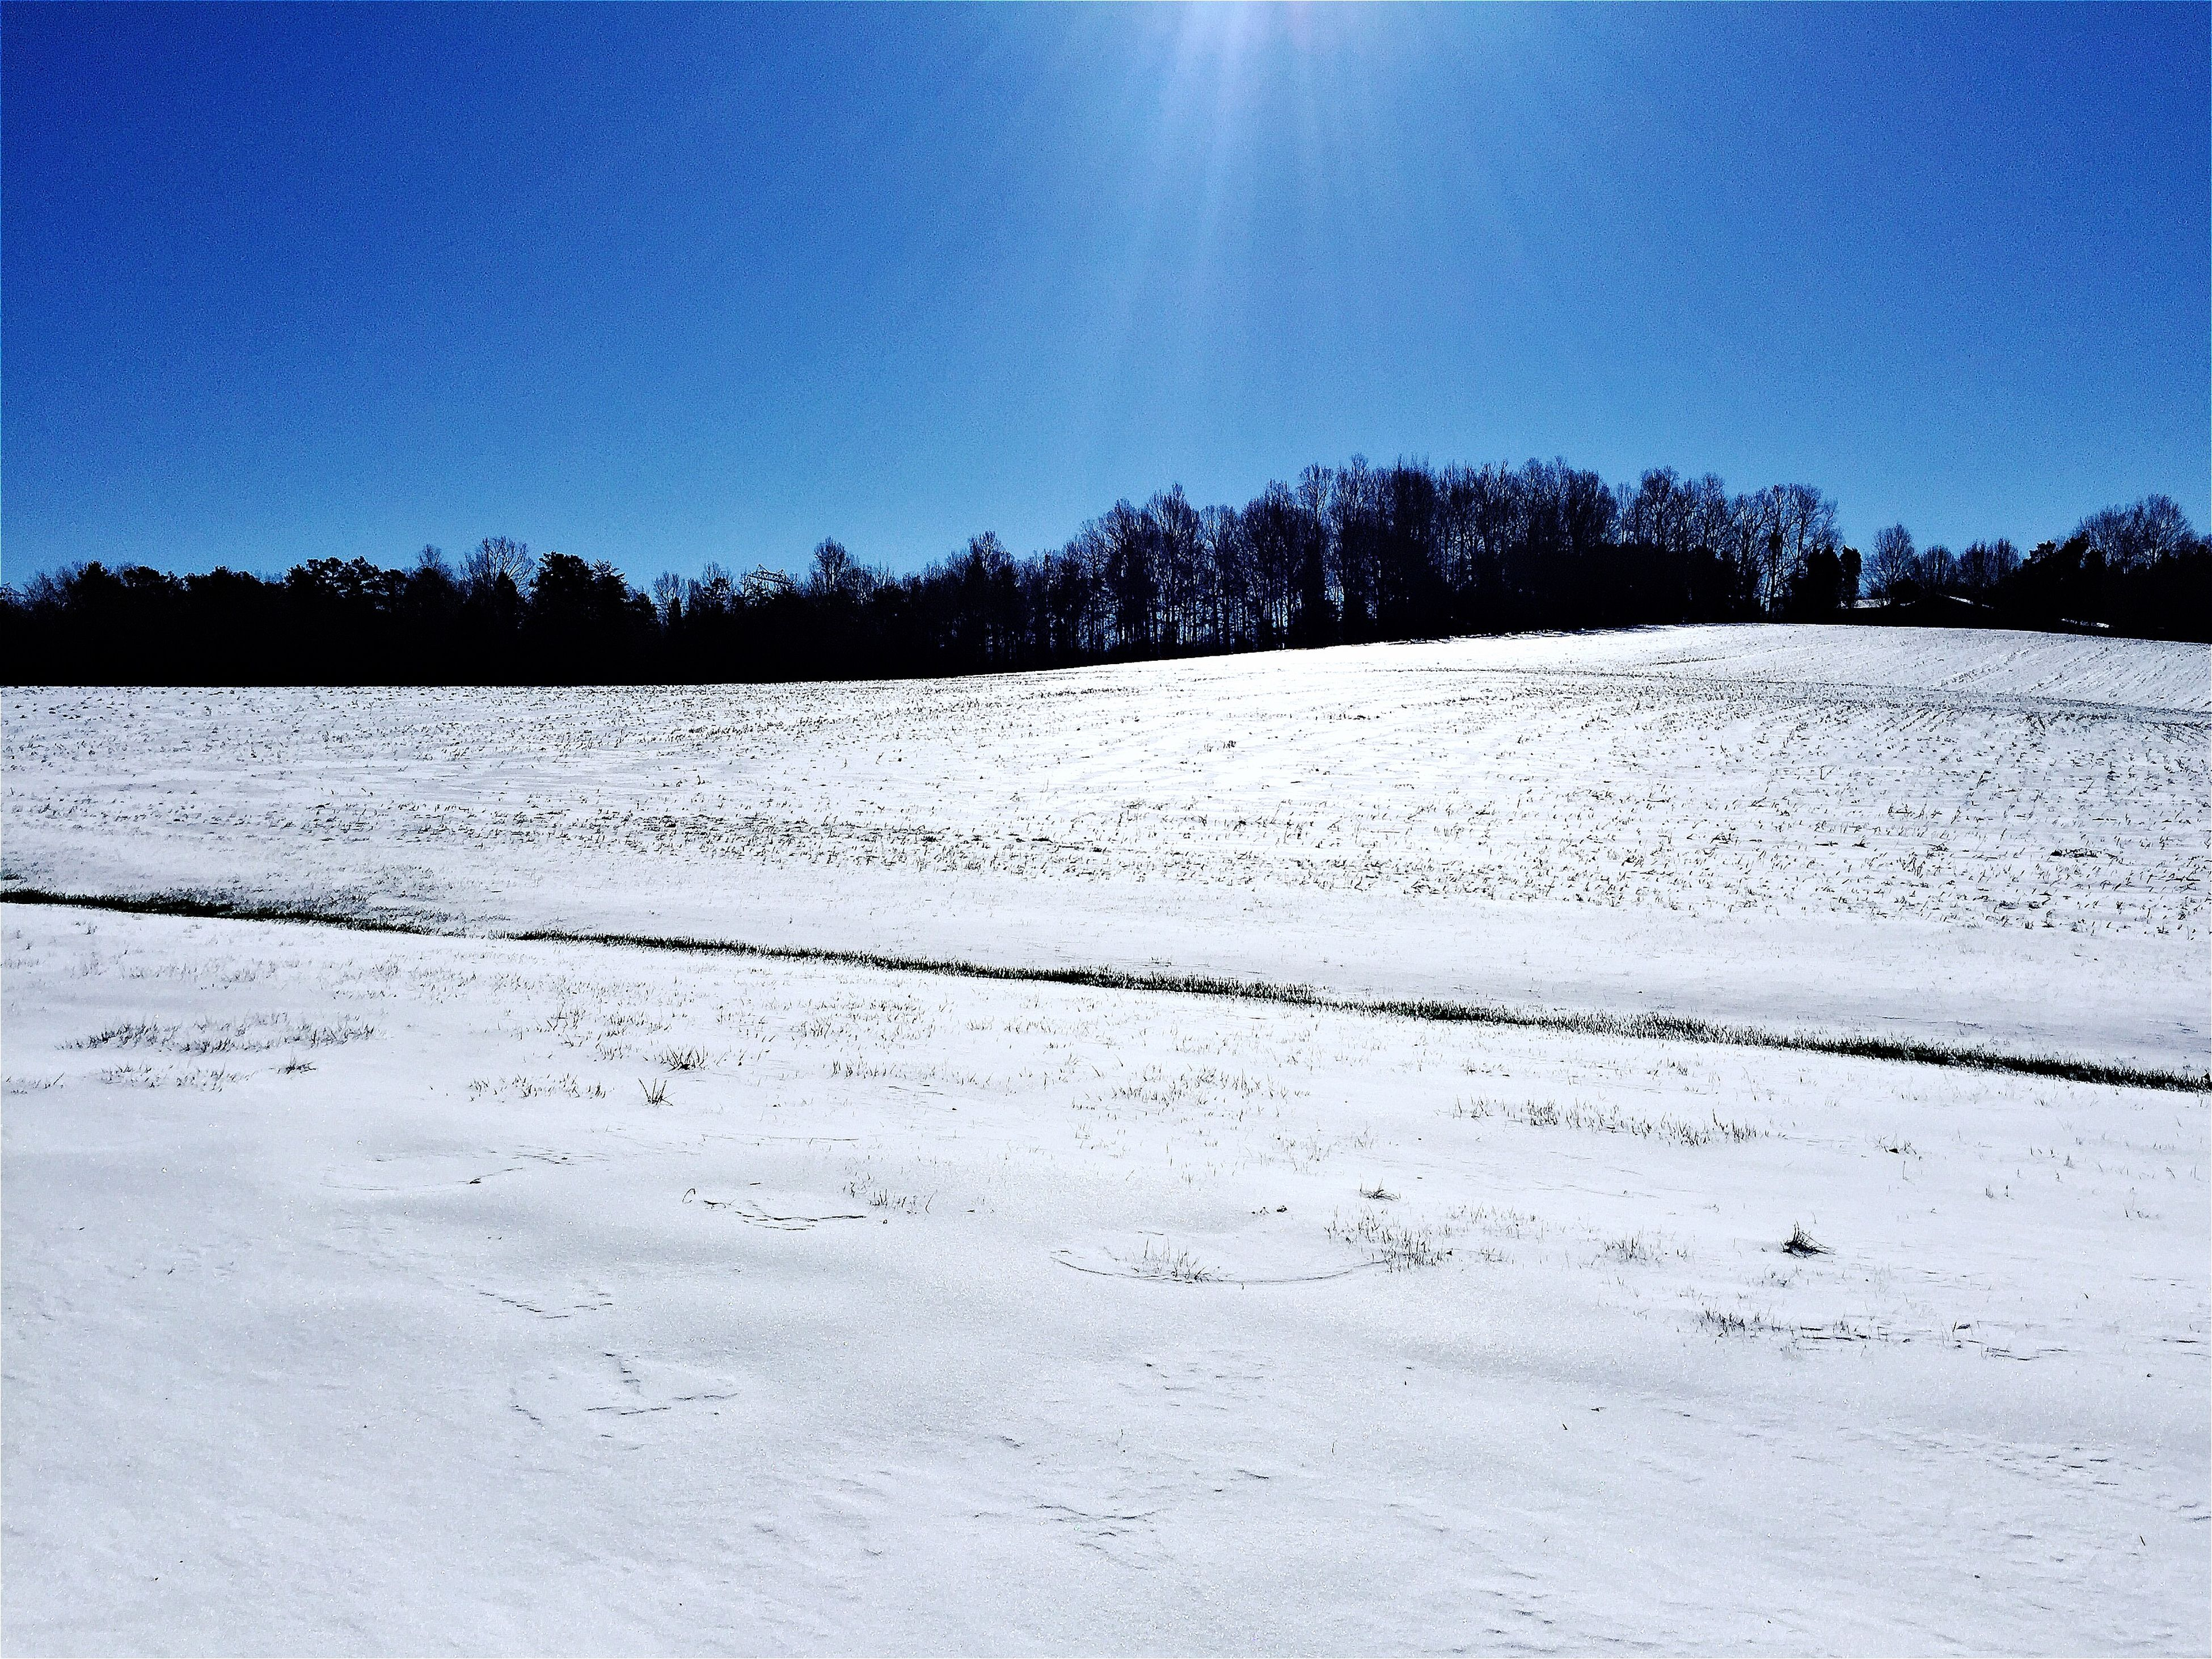 snow, clear sky, cold temperature, winter, blue, tranquility, tranquil scene, landscape, copy space, nature, beauty in nature, scenics, white color, season, tree, sunlight, sand, field, non-urban scene, white